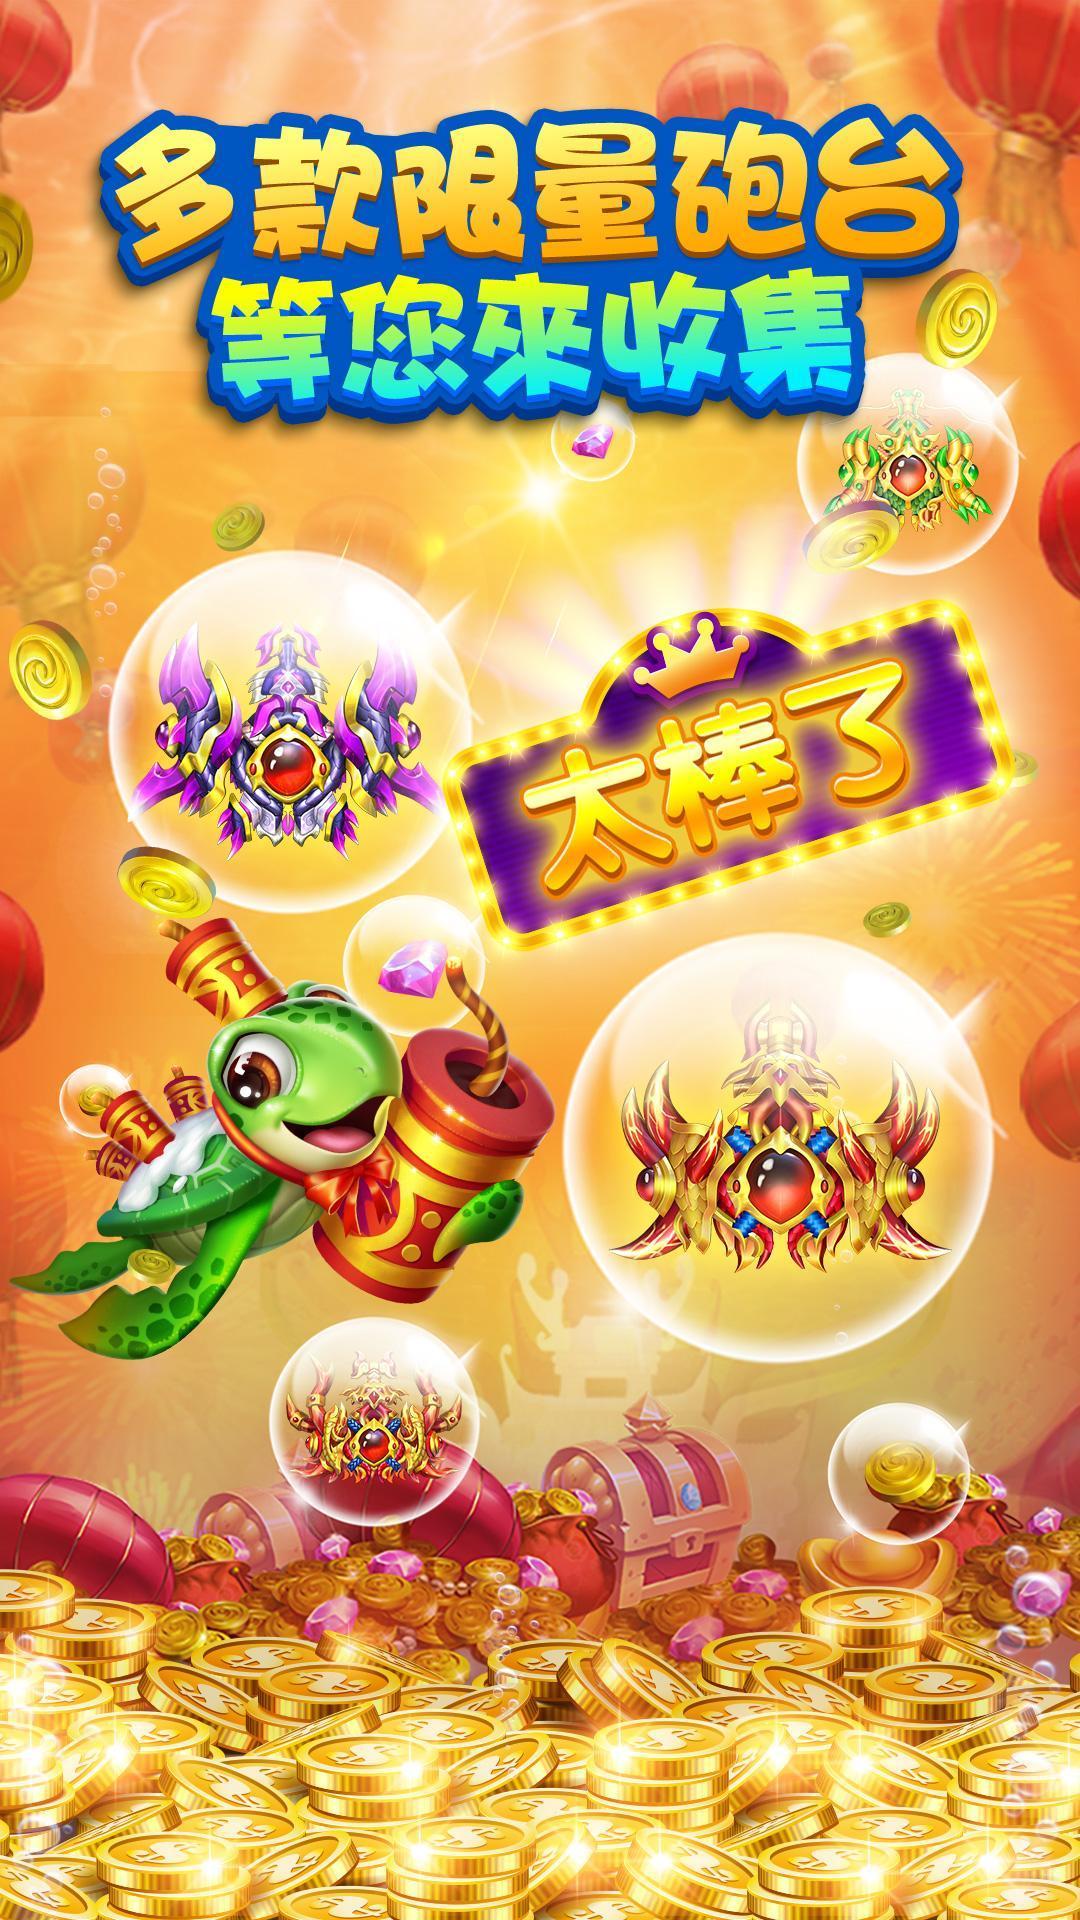 Fish is Coming: Best 3D Arcade 1.16.2 Screenshot 16